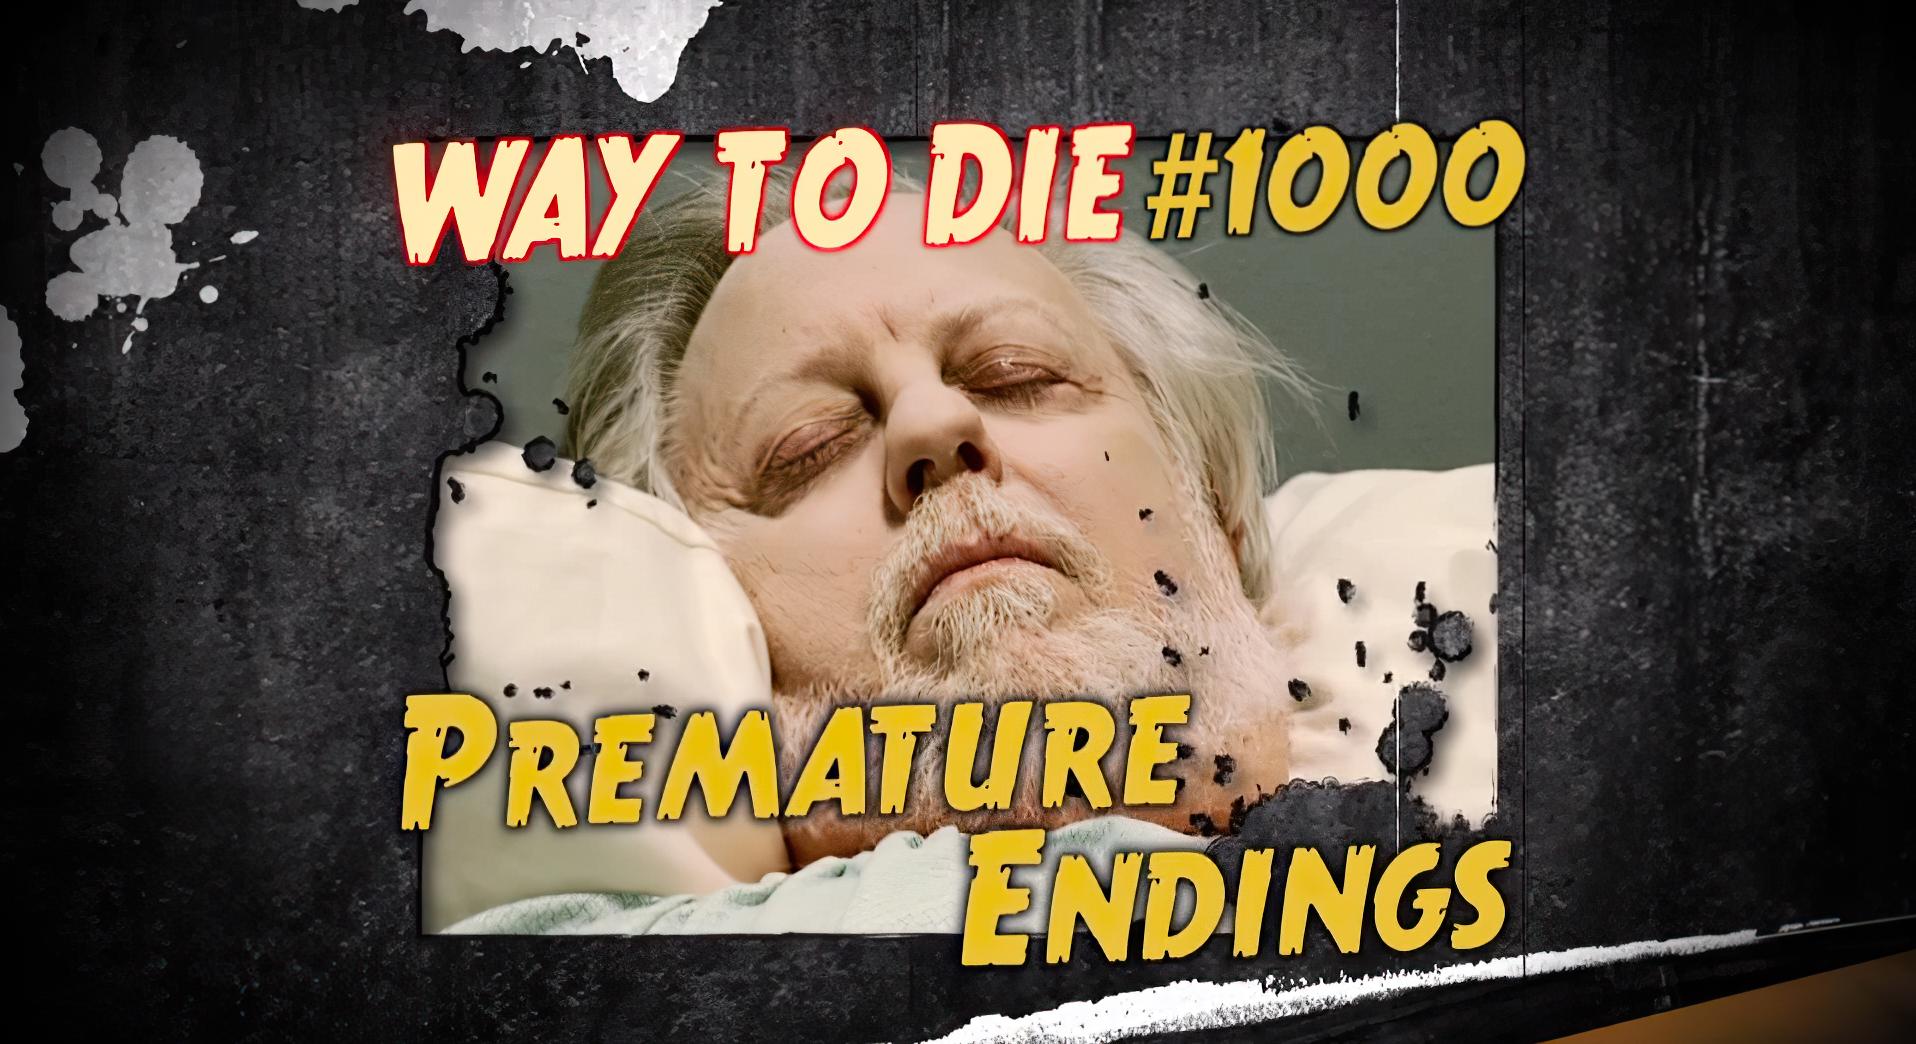 premature endings 1000 ways to die wiki fandom powered by wikia